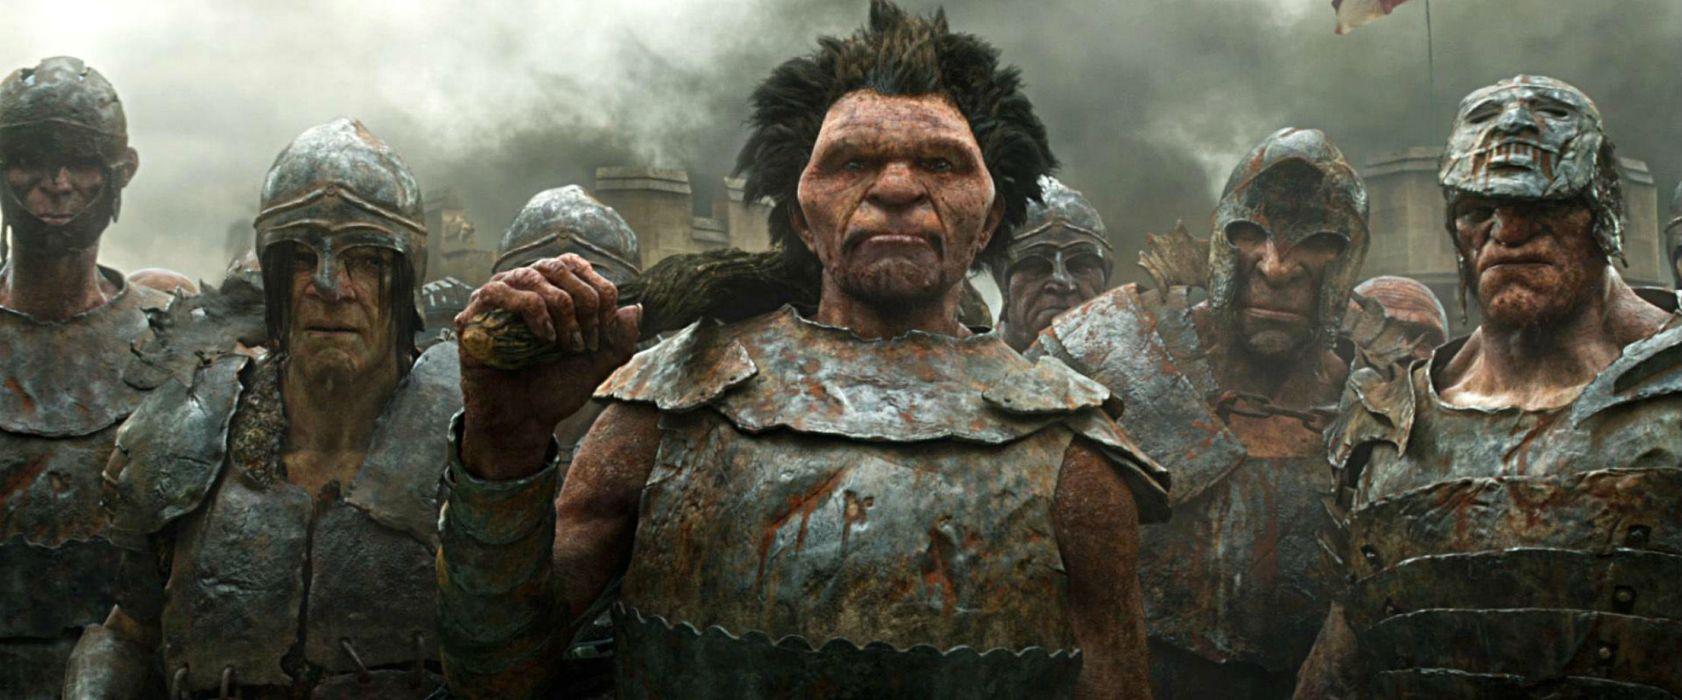 Jack The Giant Slayer 2013 fantasy adventure  hf wallpaper